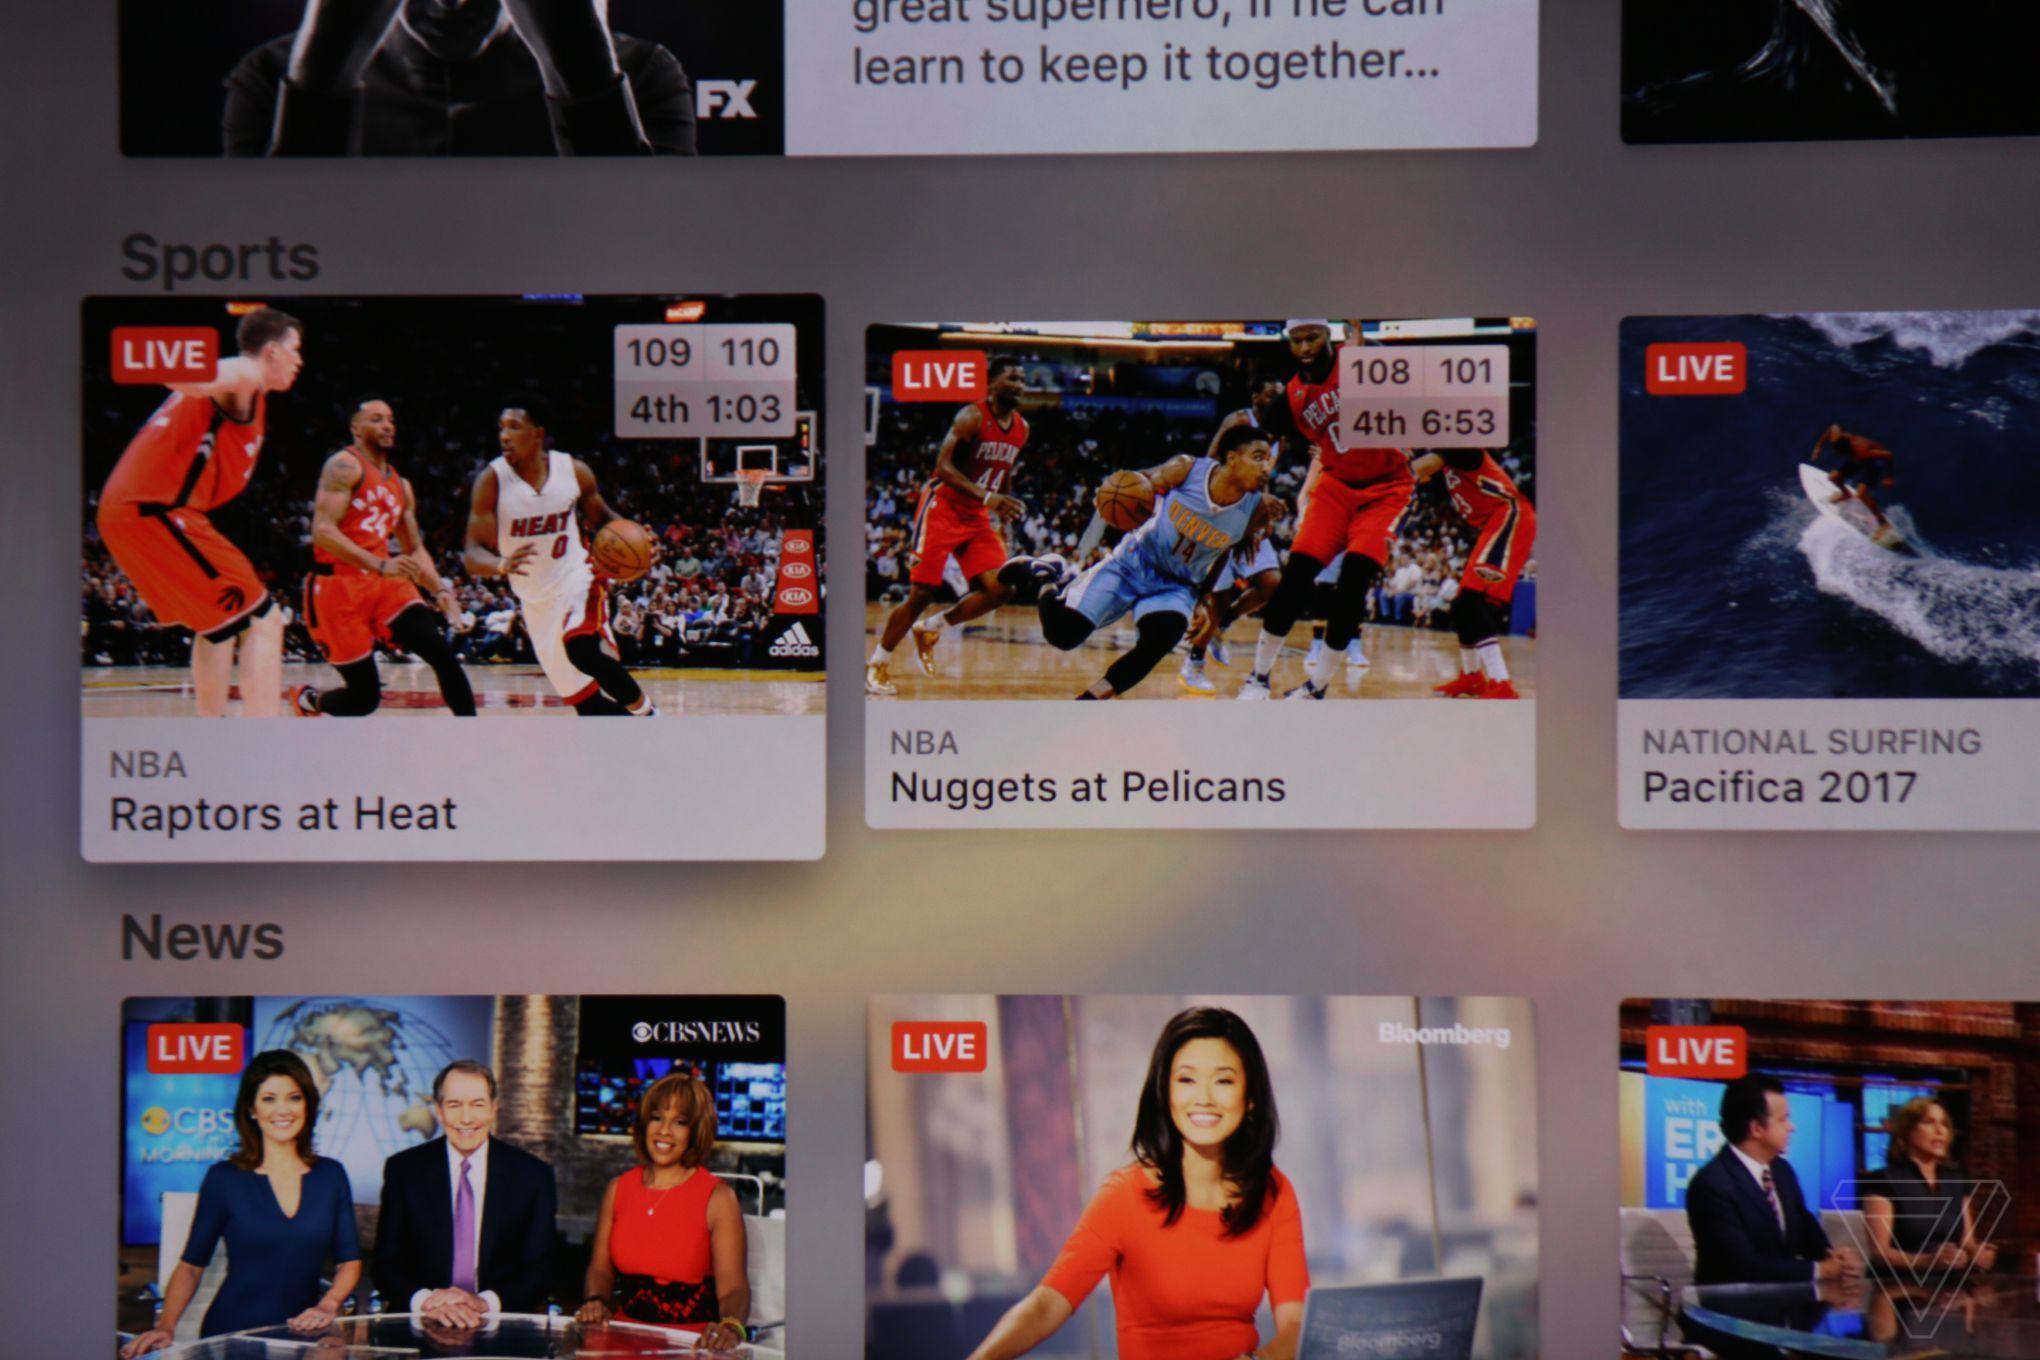 Apple TV Live Sports